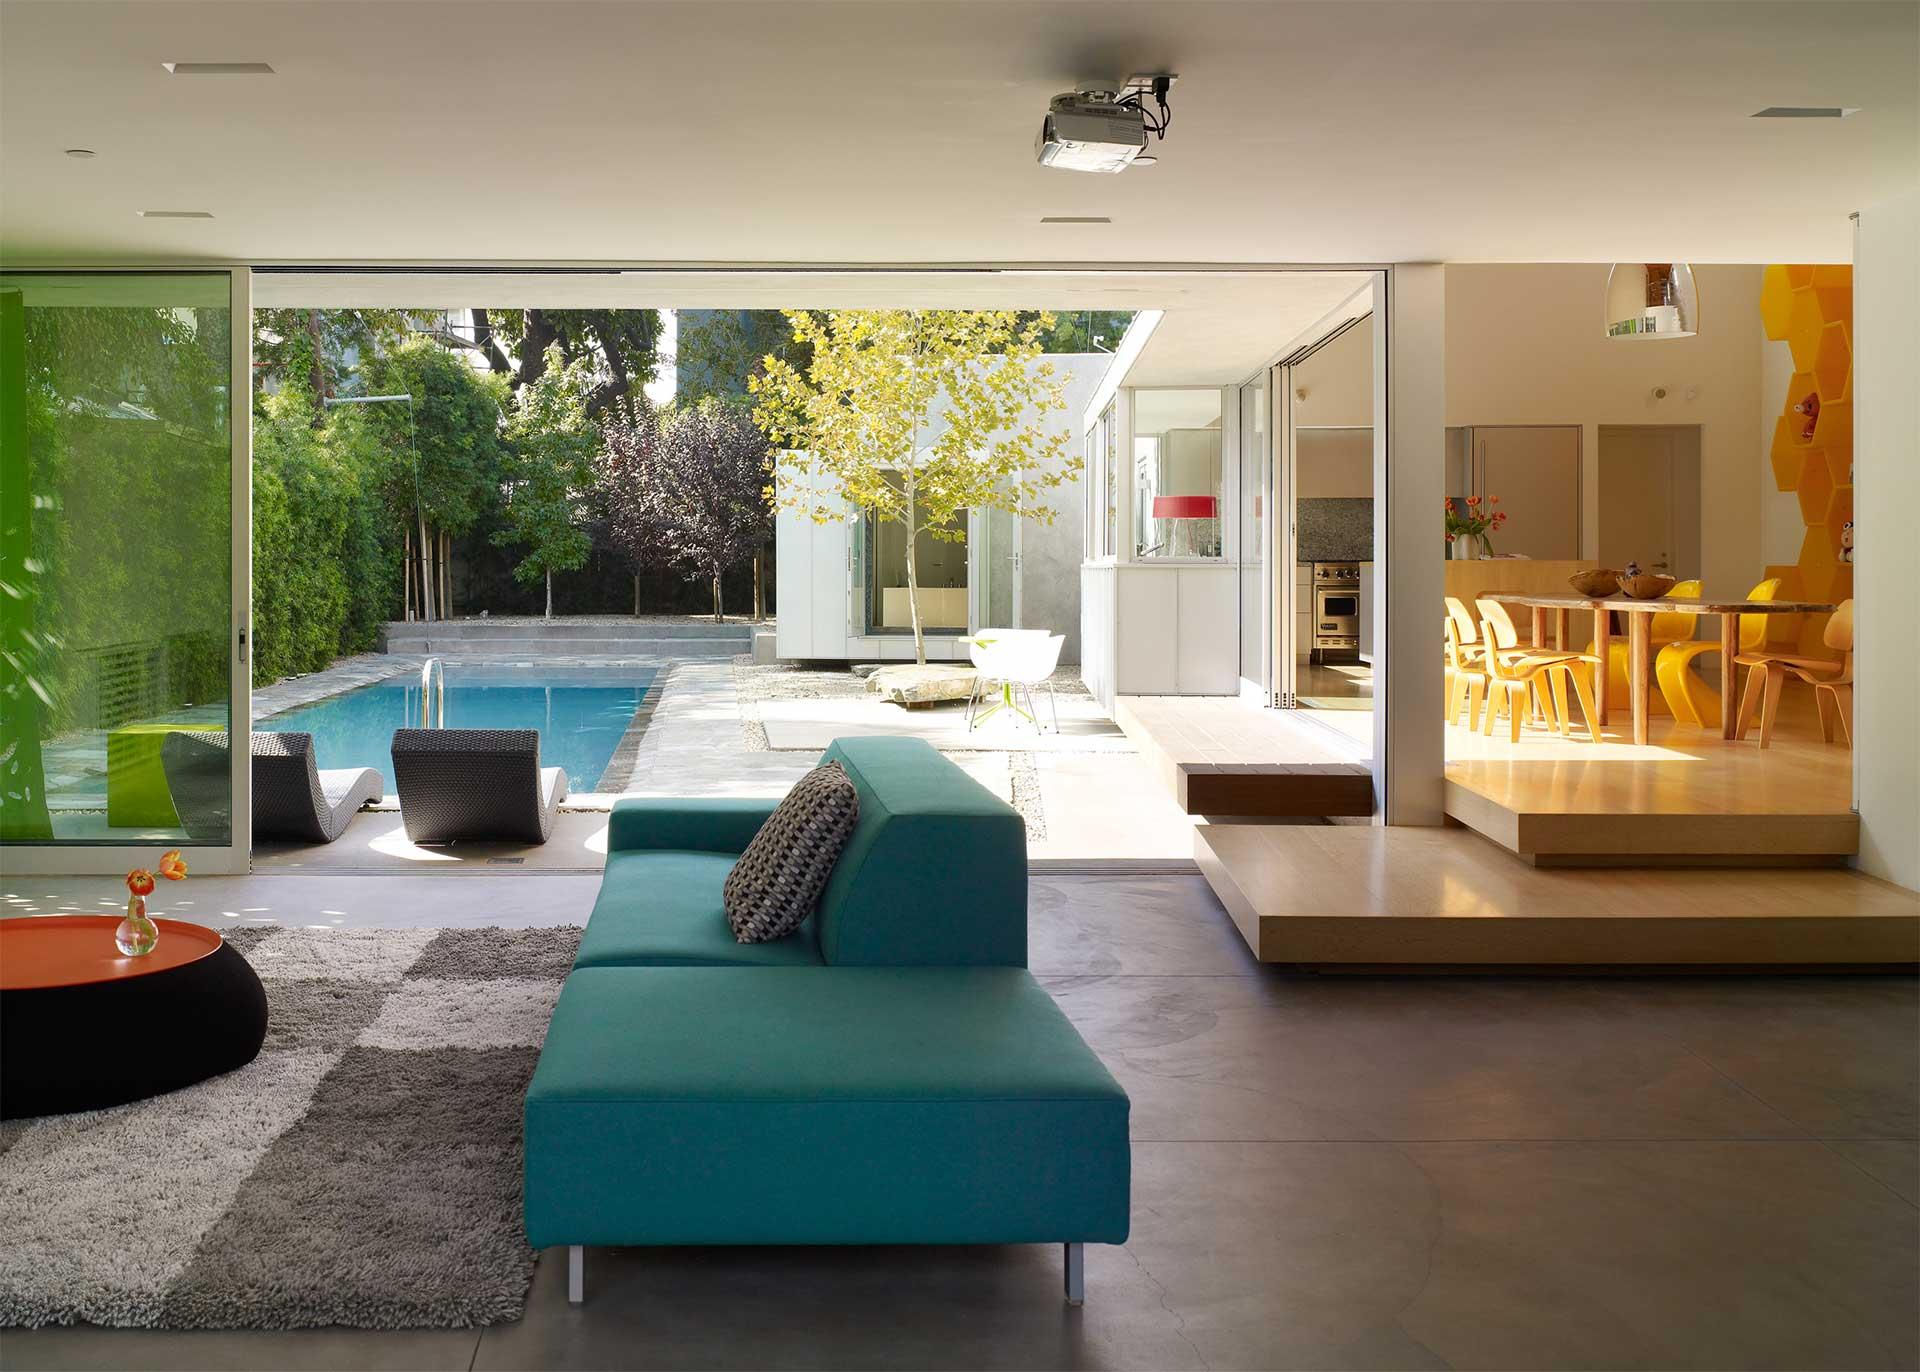 07 West Hollywood Residence